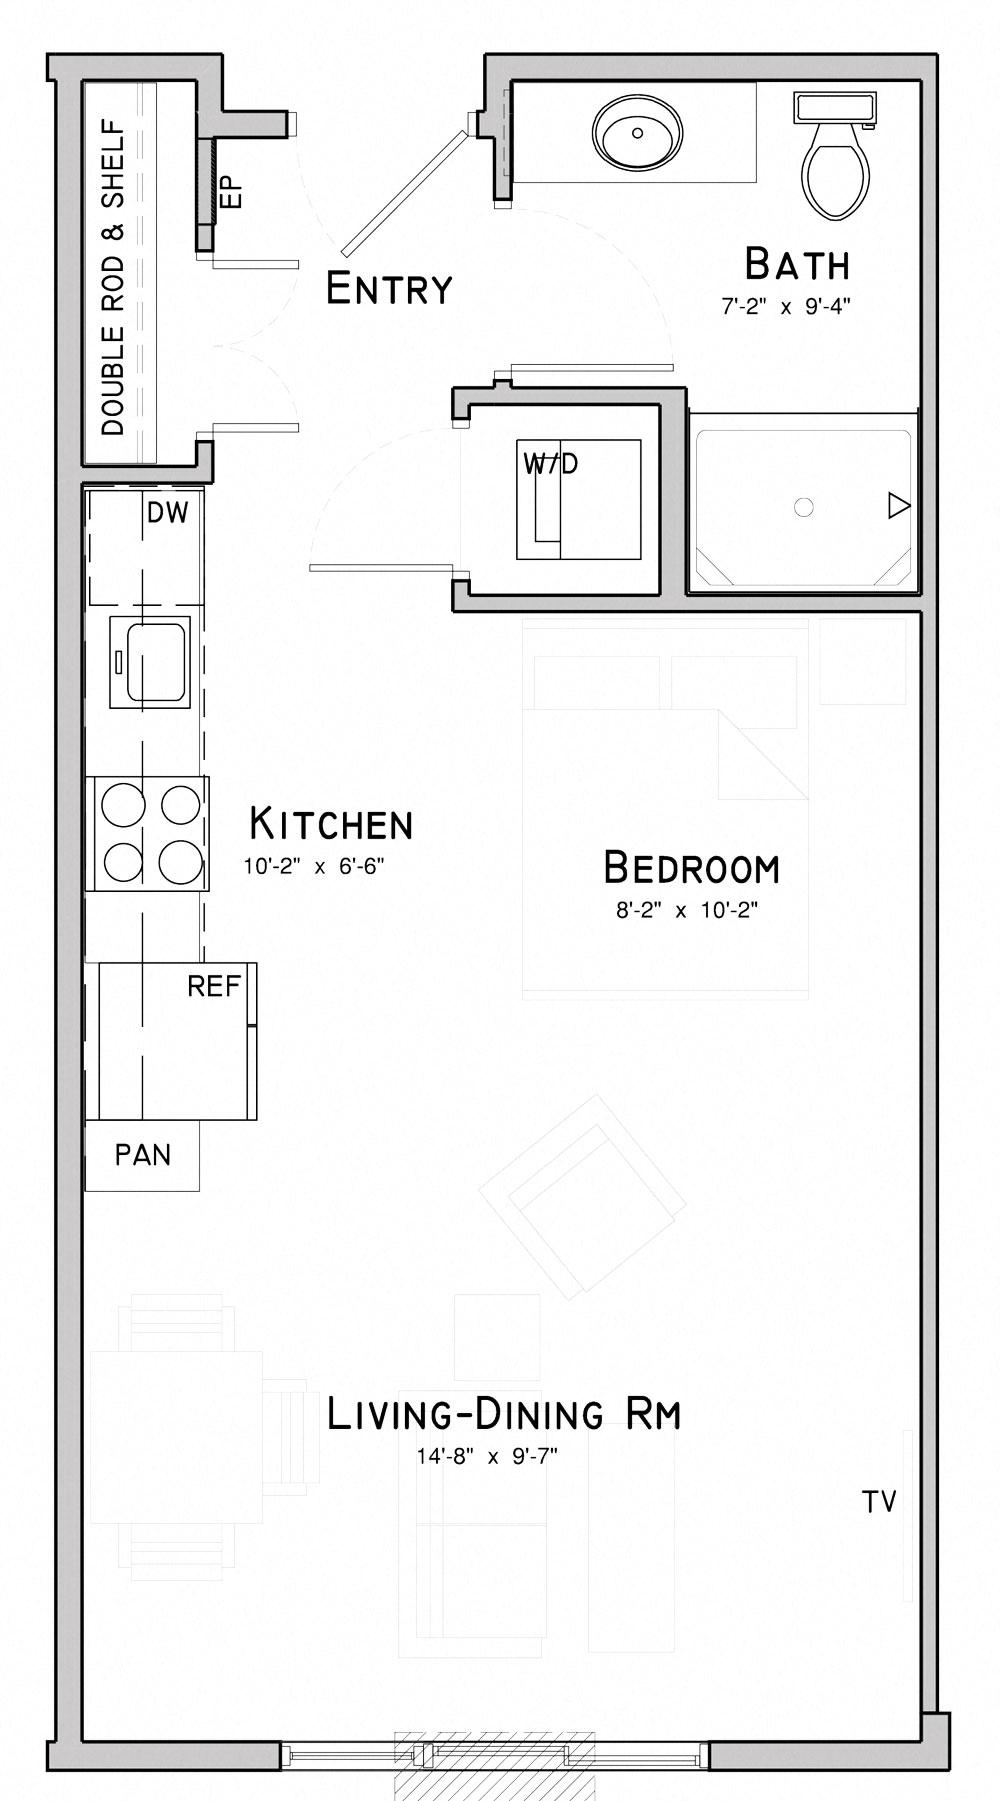 Suite A Floorplan Floor Planjade